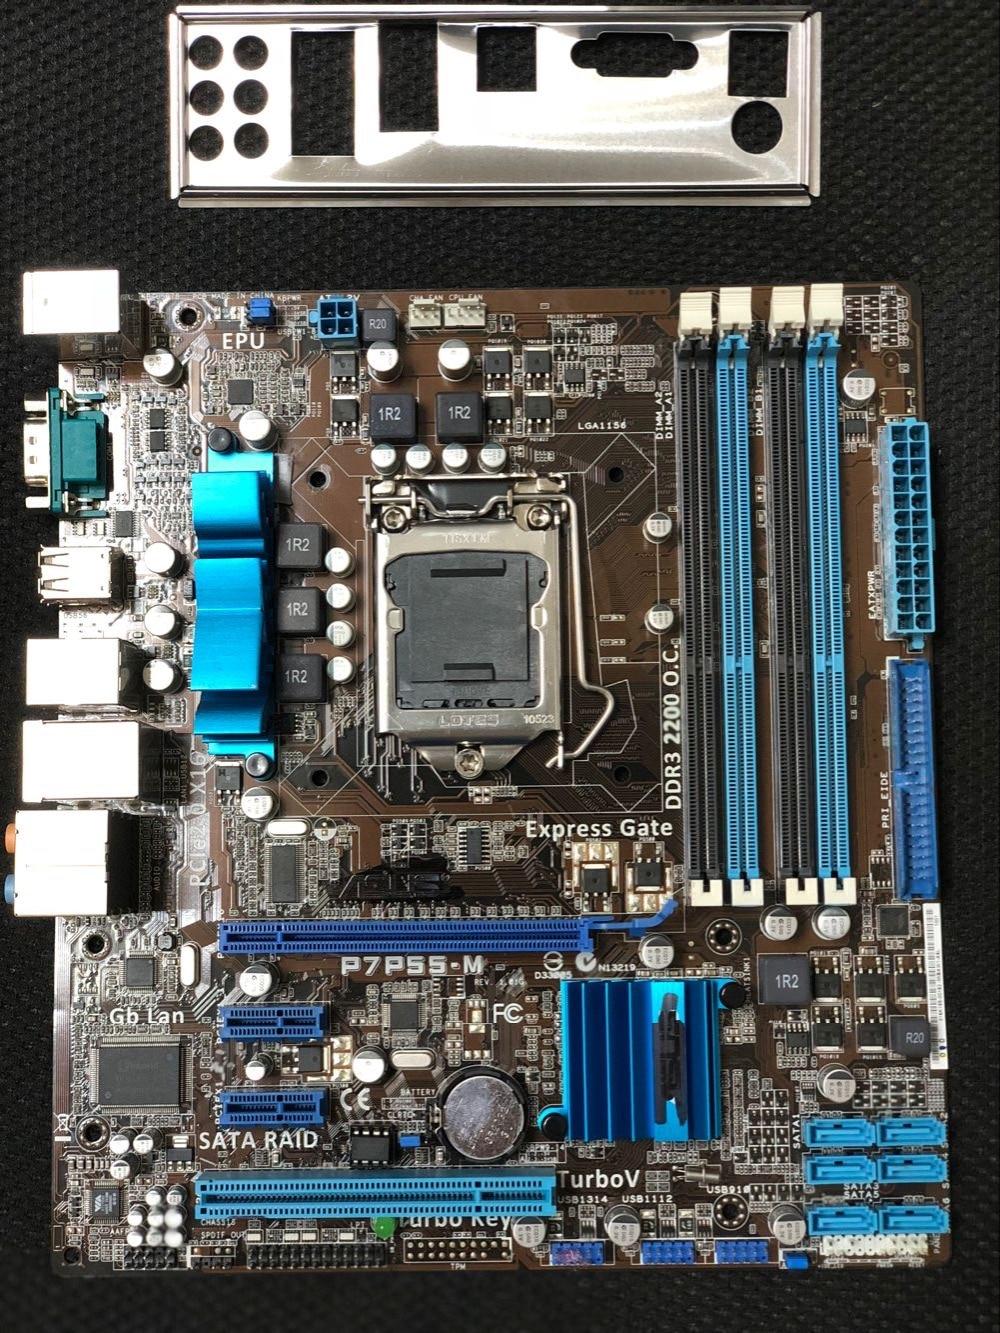 original motherboard for ASUS P7P55-M DDR3 LGA 1156 USB2.0 for I5 I7 cpu 16GB SATA2 P55 Desktop motherborad Free shipping все цены